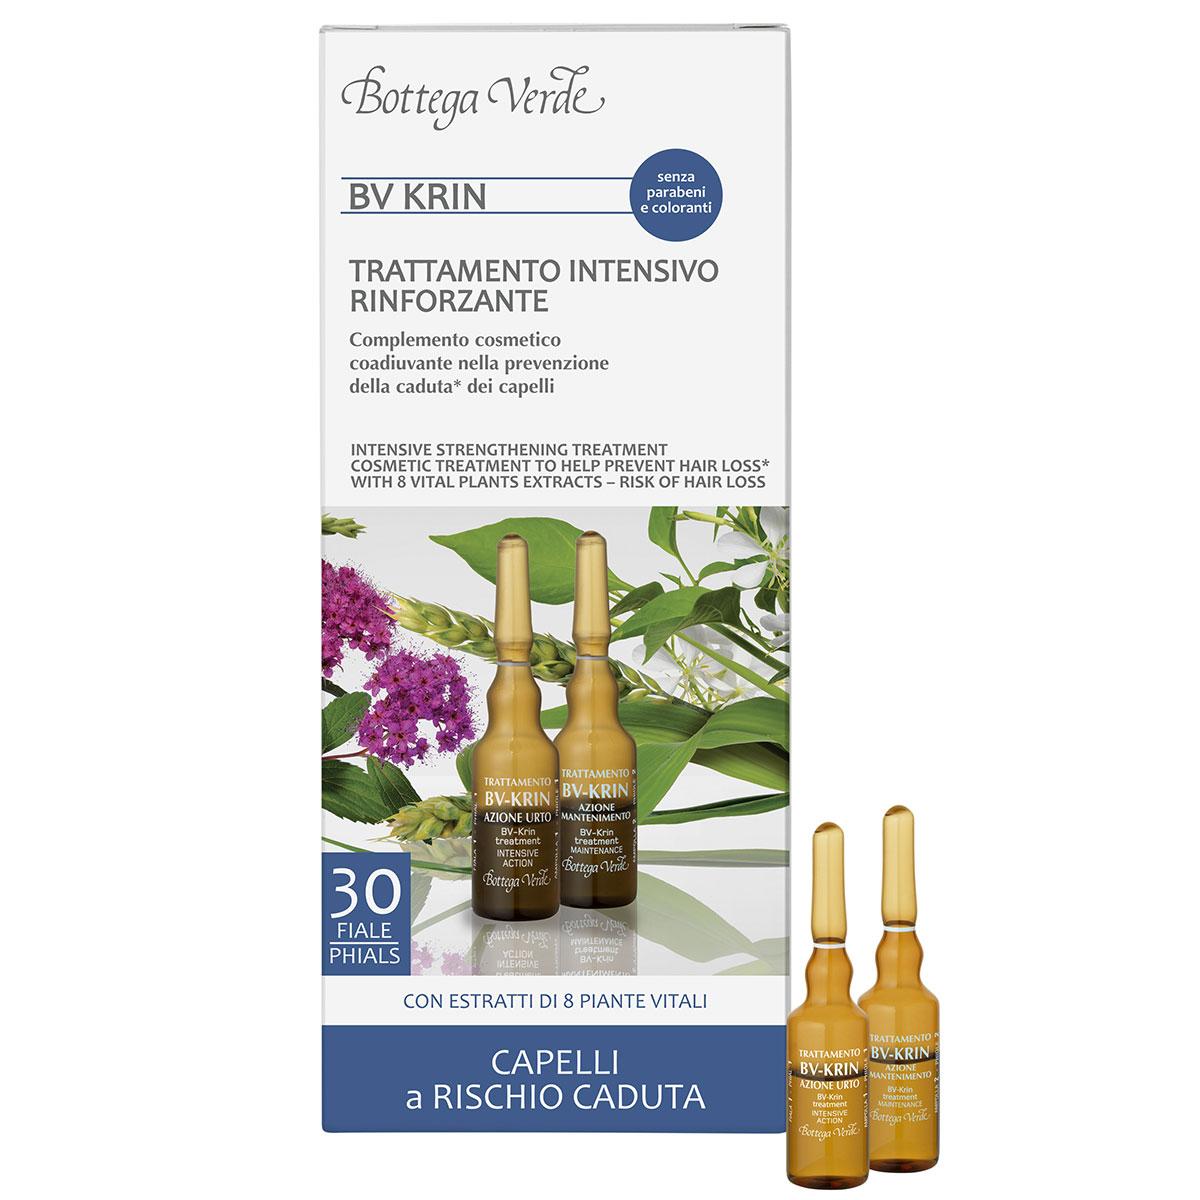 Tratament pentru prevenirea caderii parului - BV Krin, Ginseng, 30 FIOLE